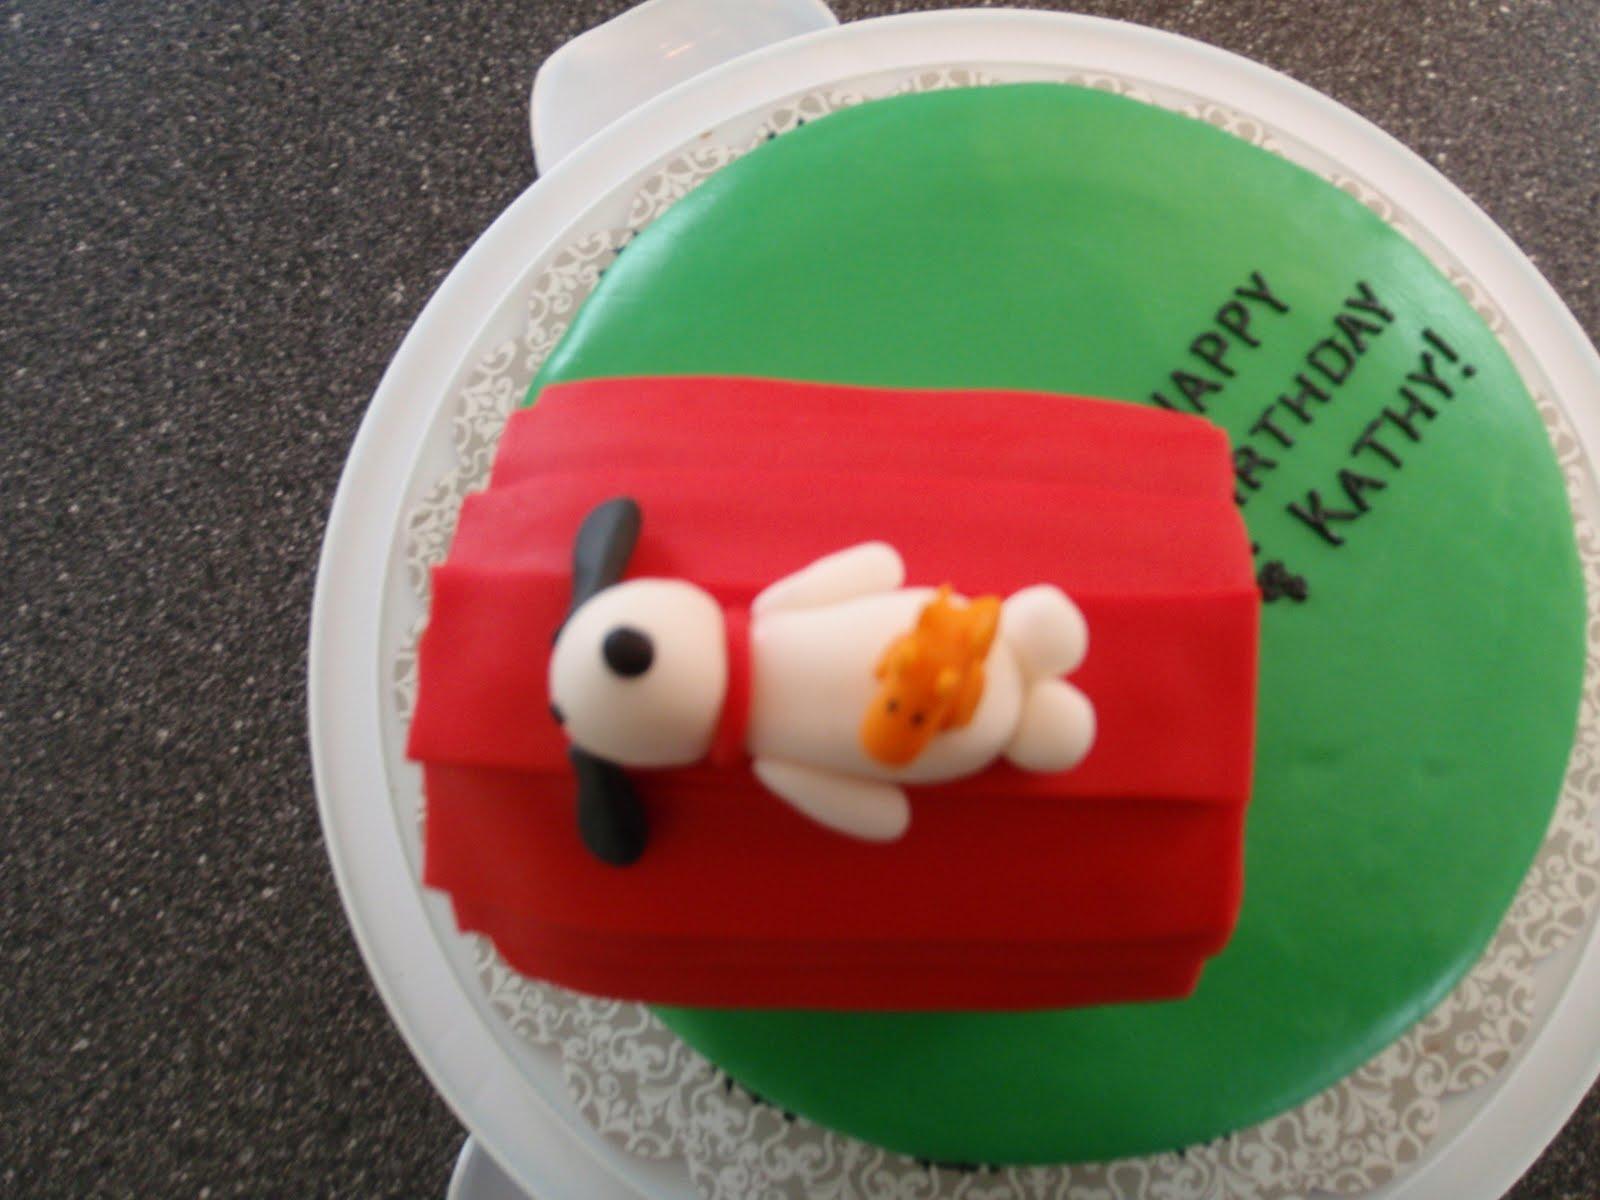 Sarah S Piece Of Cake Snoopy Cake For Kathy